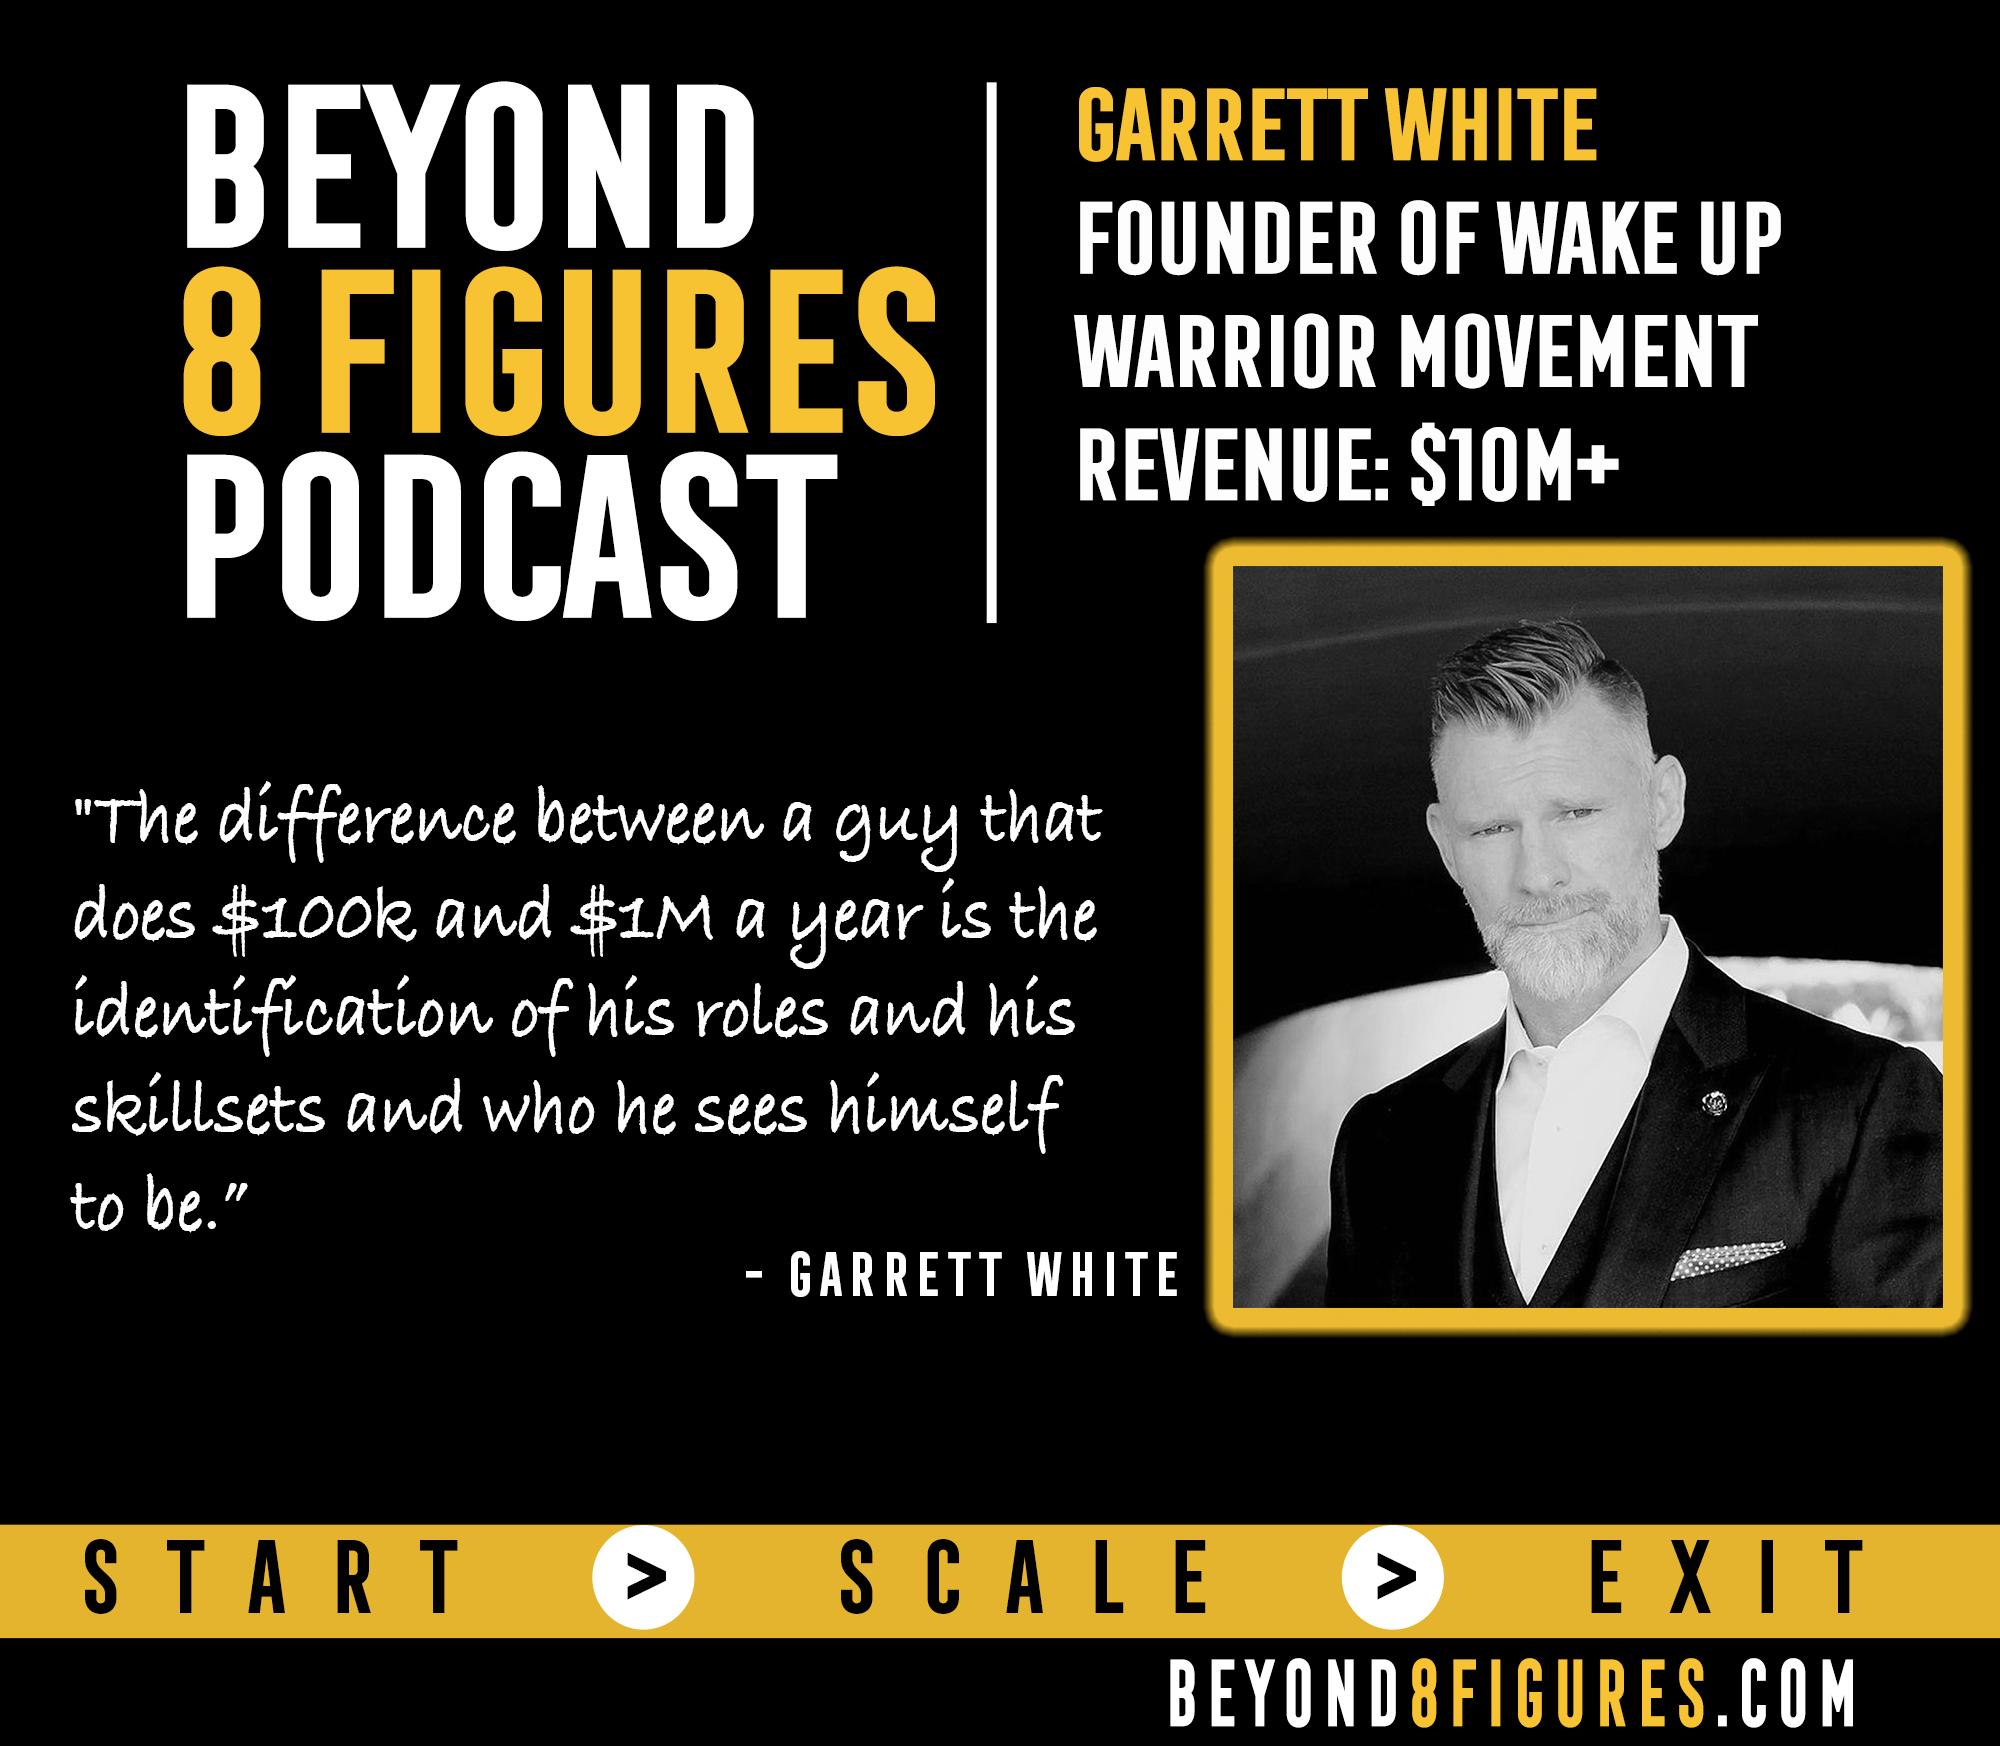 Garrett White Runs Wake Up Warrior Which Generates $10M+ Annually